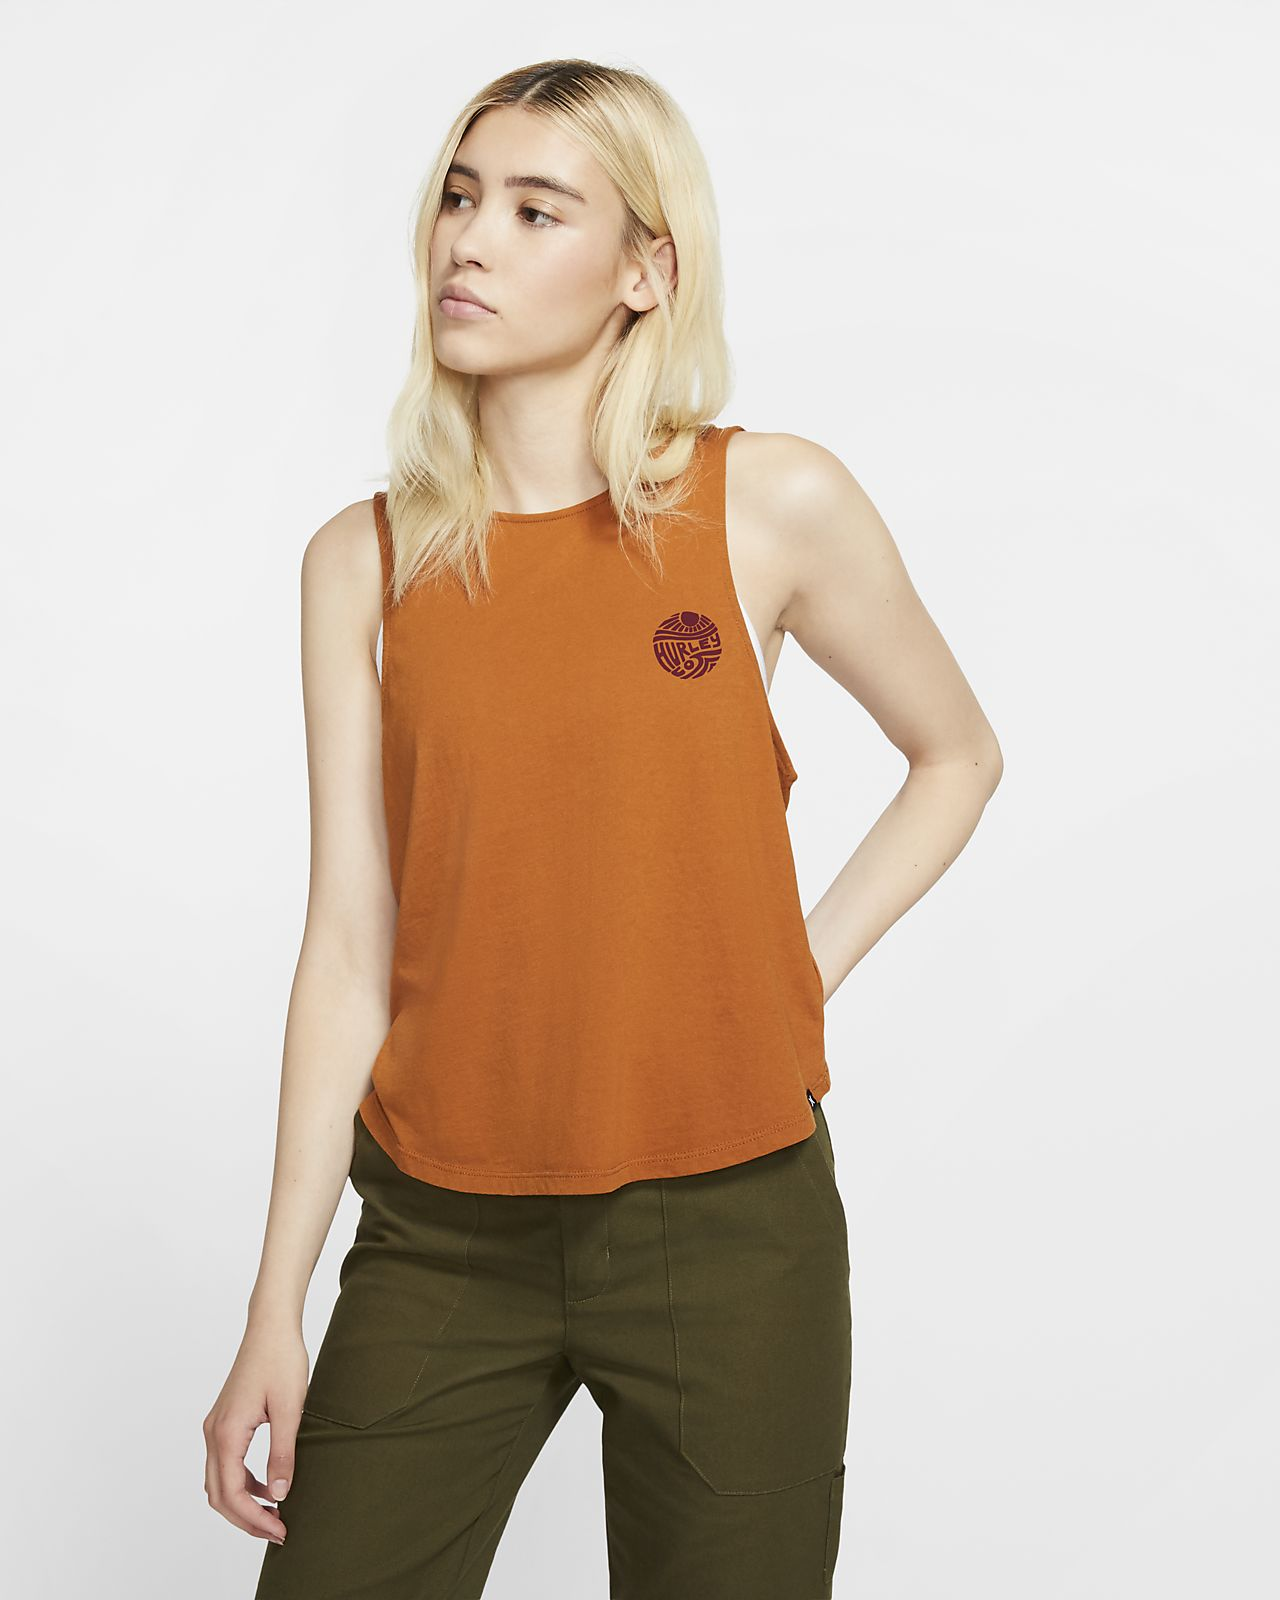 Damska koszulka bez rękawów Hurley Escaper Flouncy